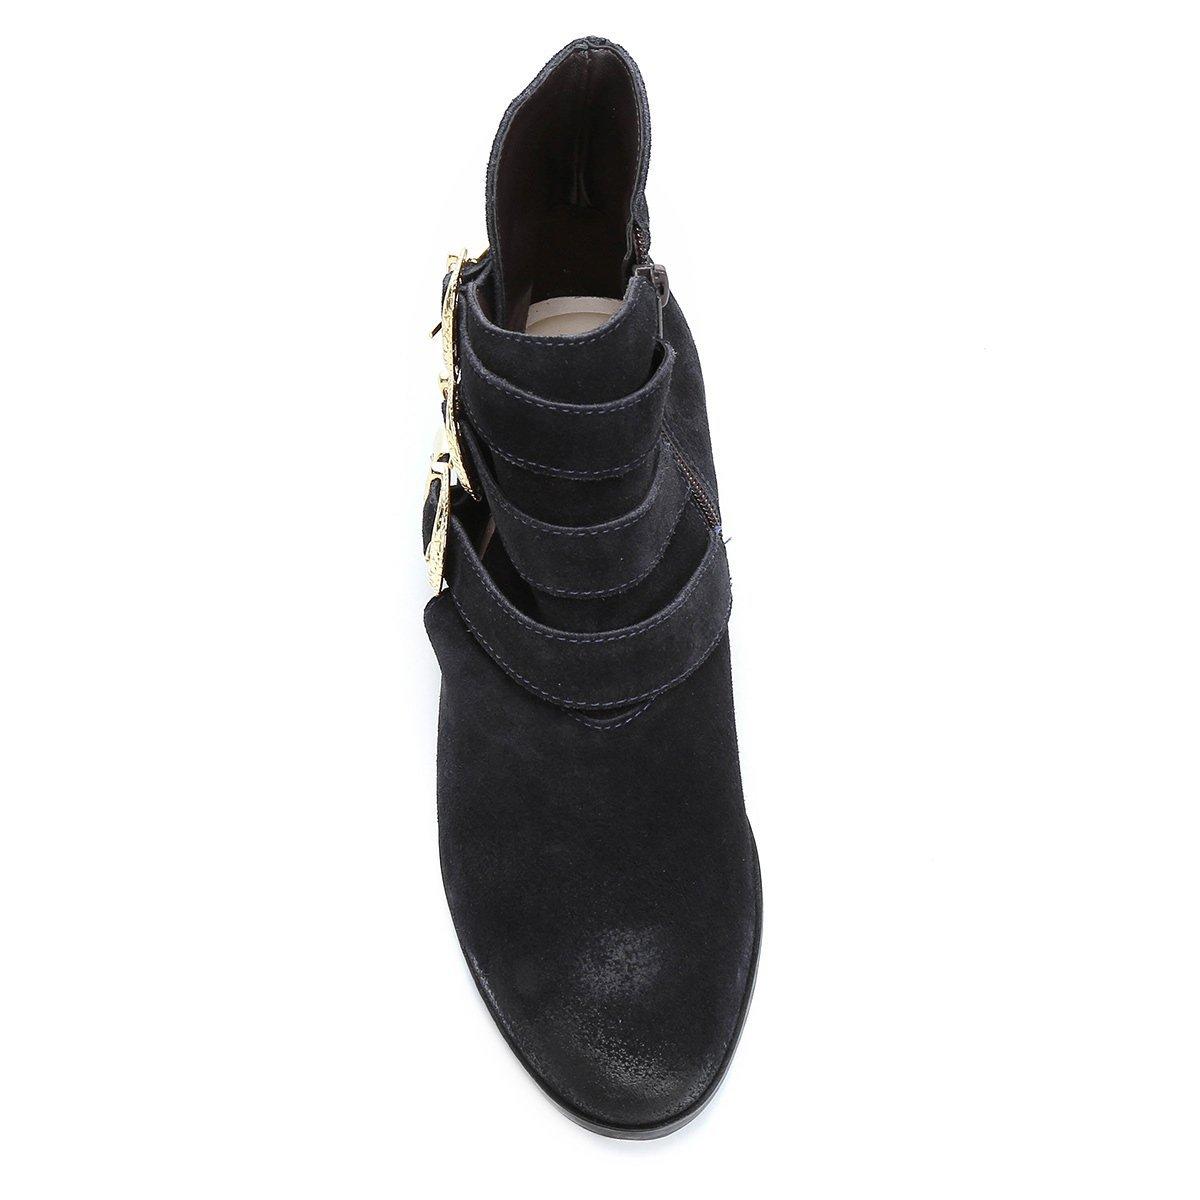 Curto Bota Couro Bota Fivelas Shoestock Cano Marinho Couro nHvTa6qc